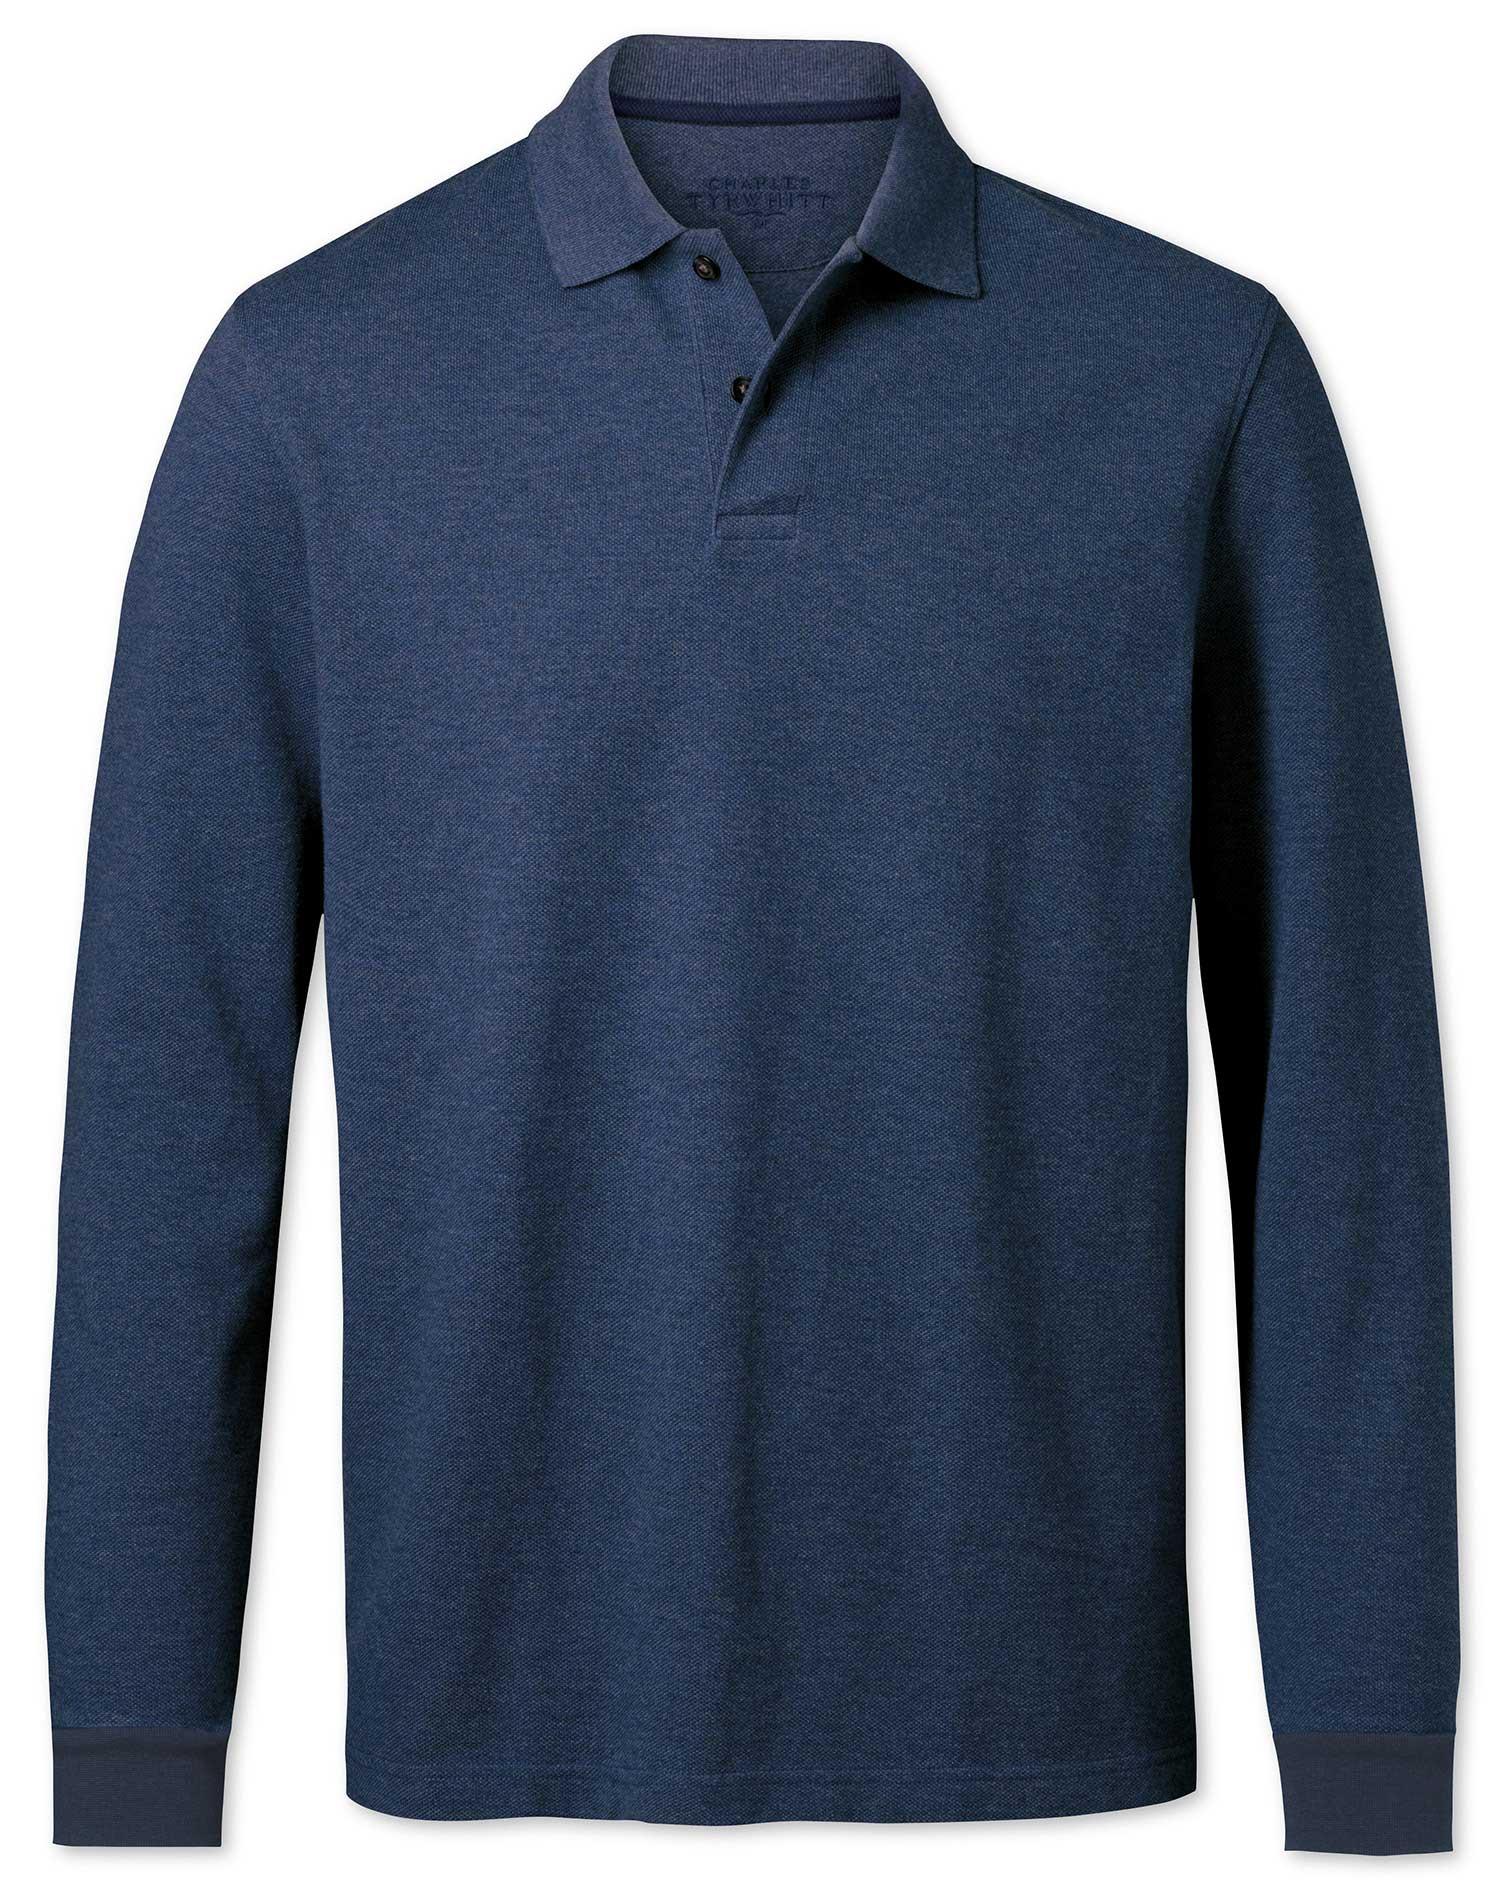 Indigo Pique Long Sleeve Cotton Polo Size Medium by Charles Tyrwhitt